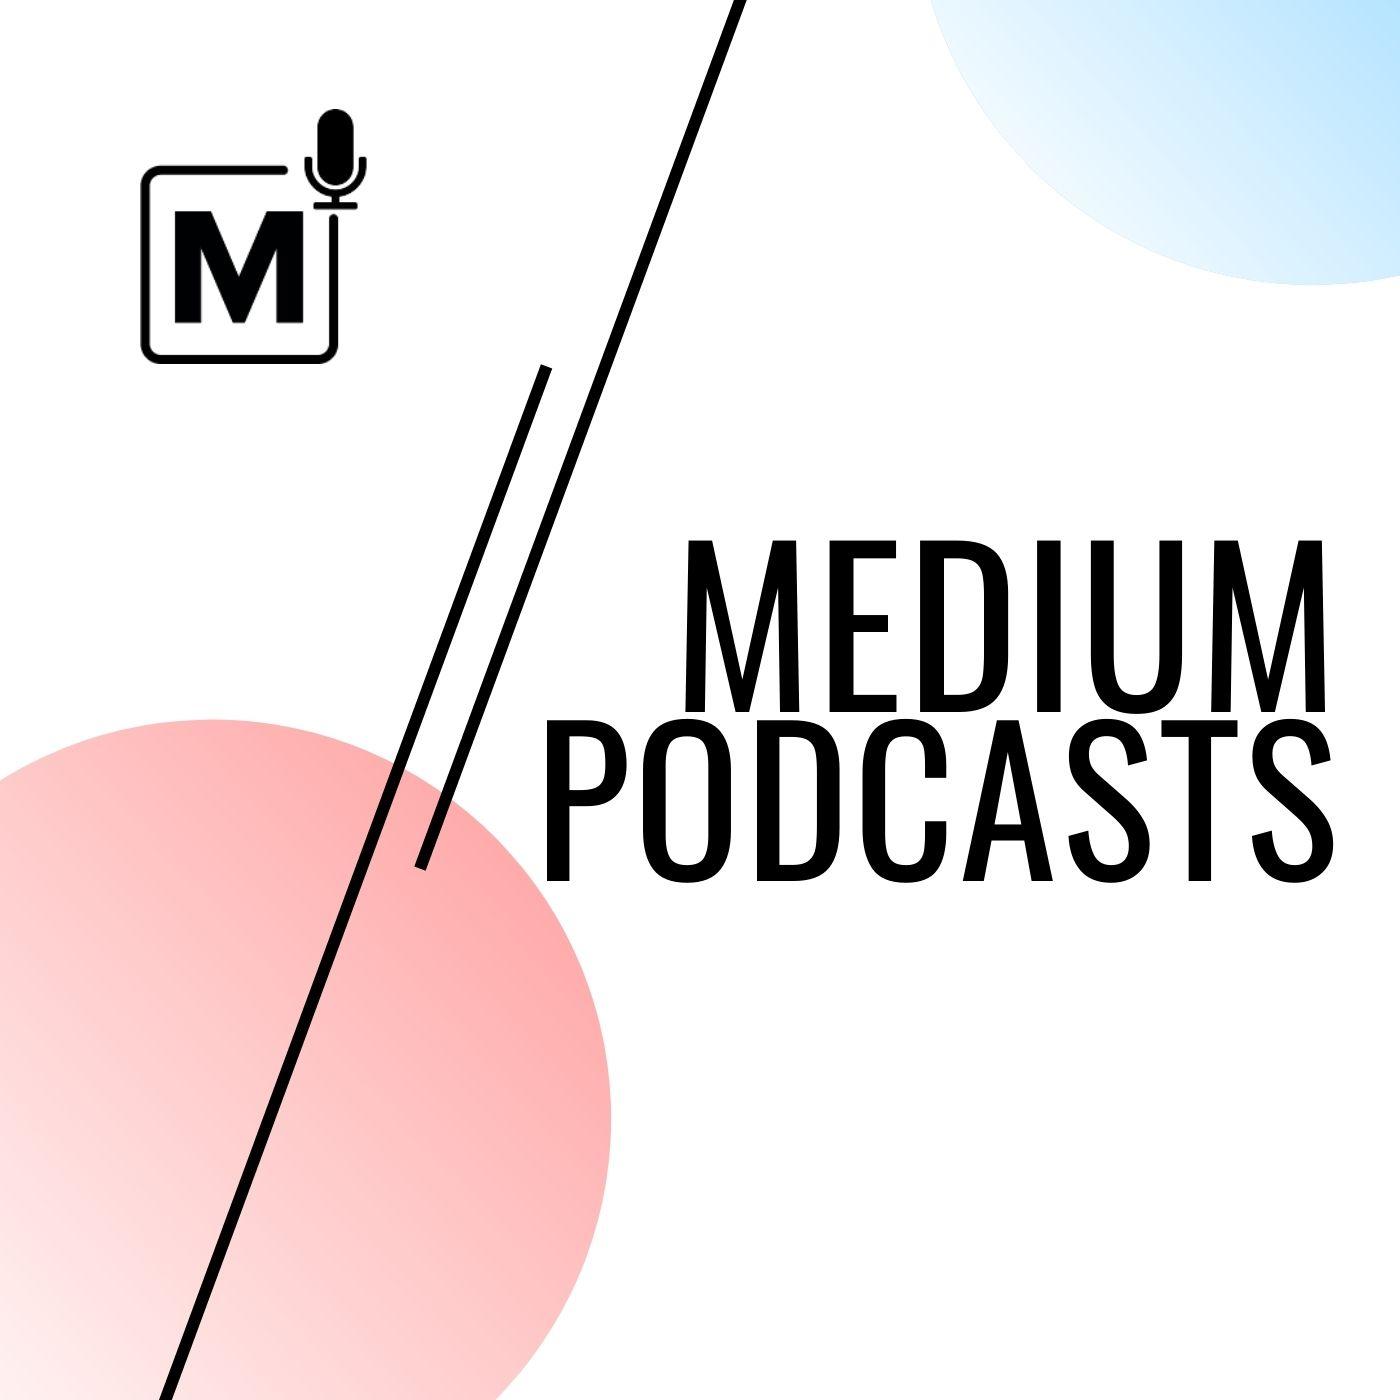 Medium Podcast